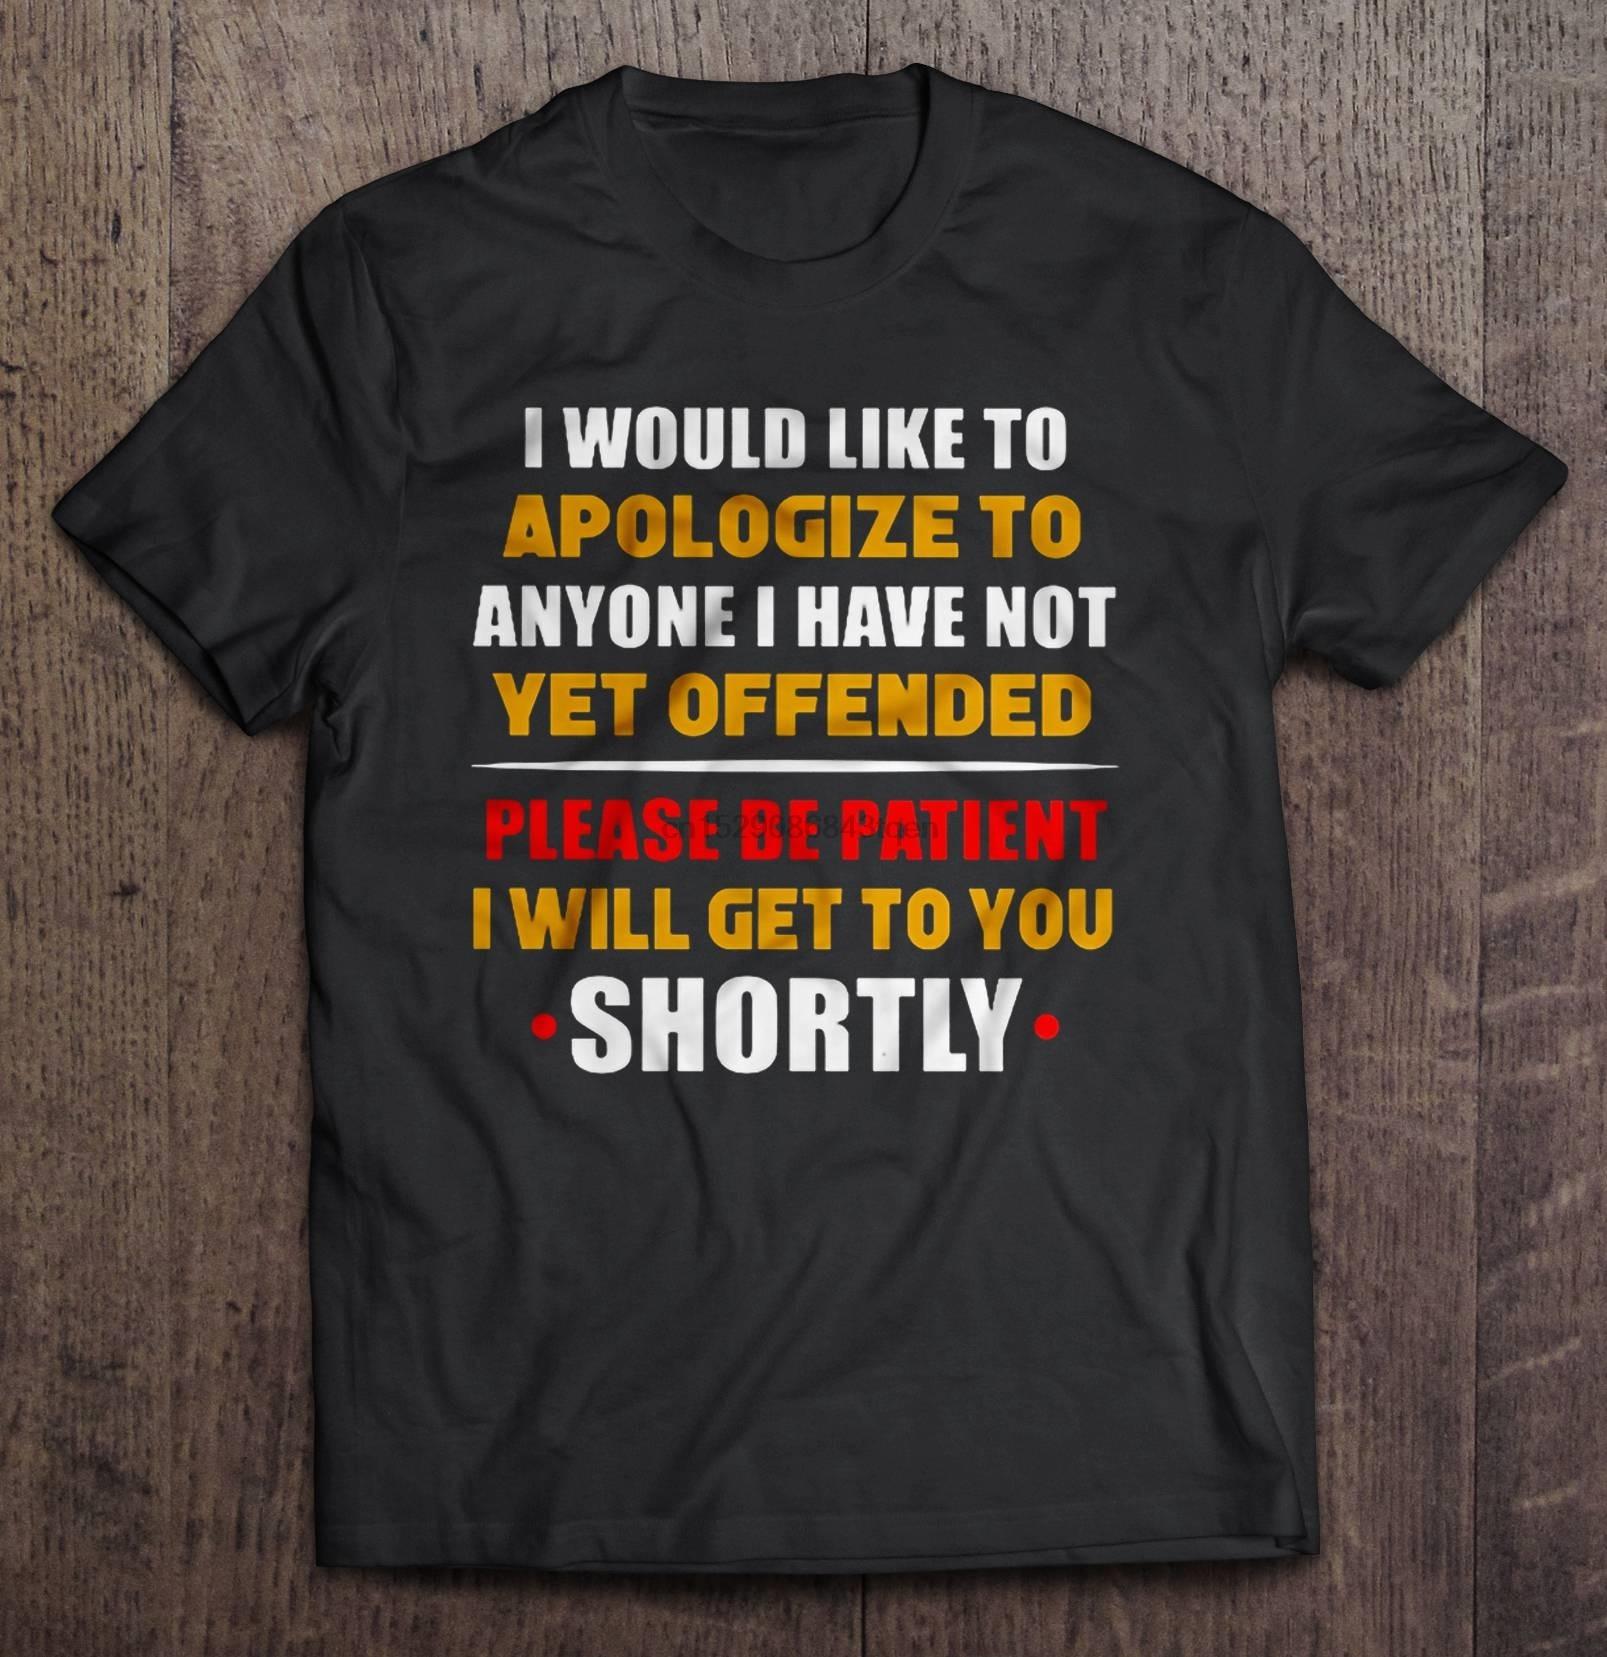 Weekend Nachos Men/'s  Apology T-shirt Black